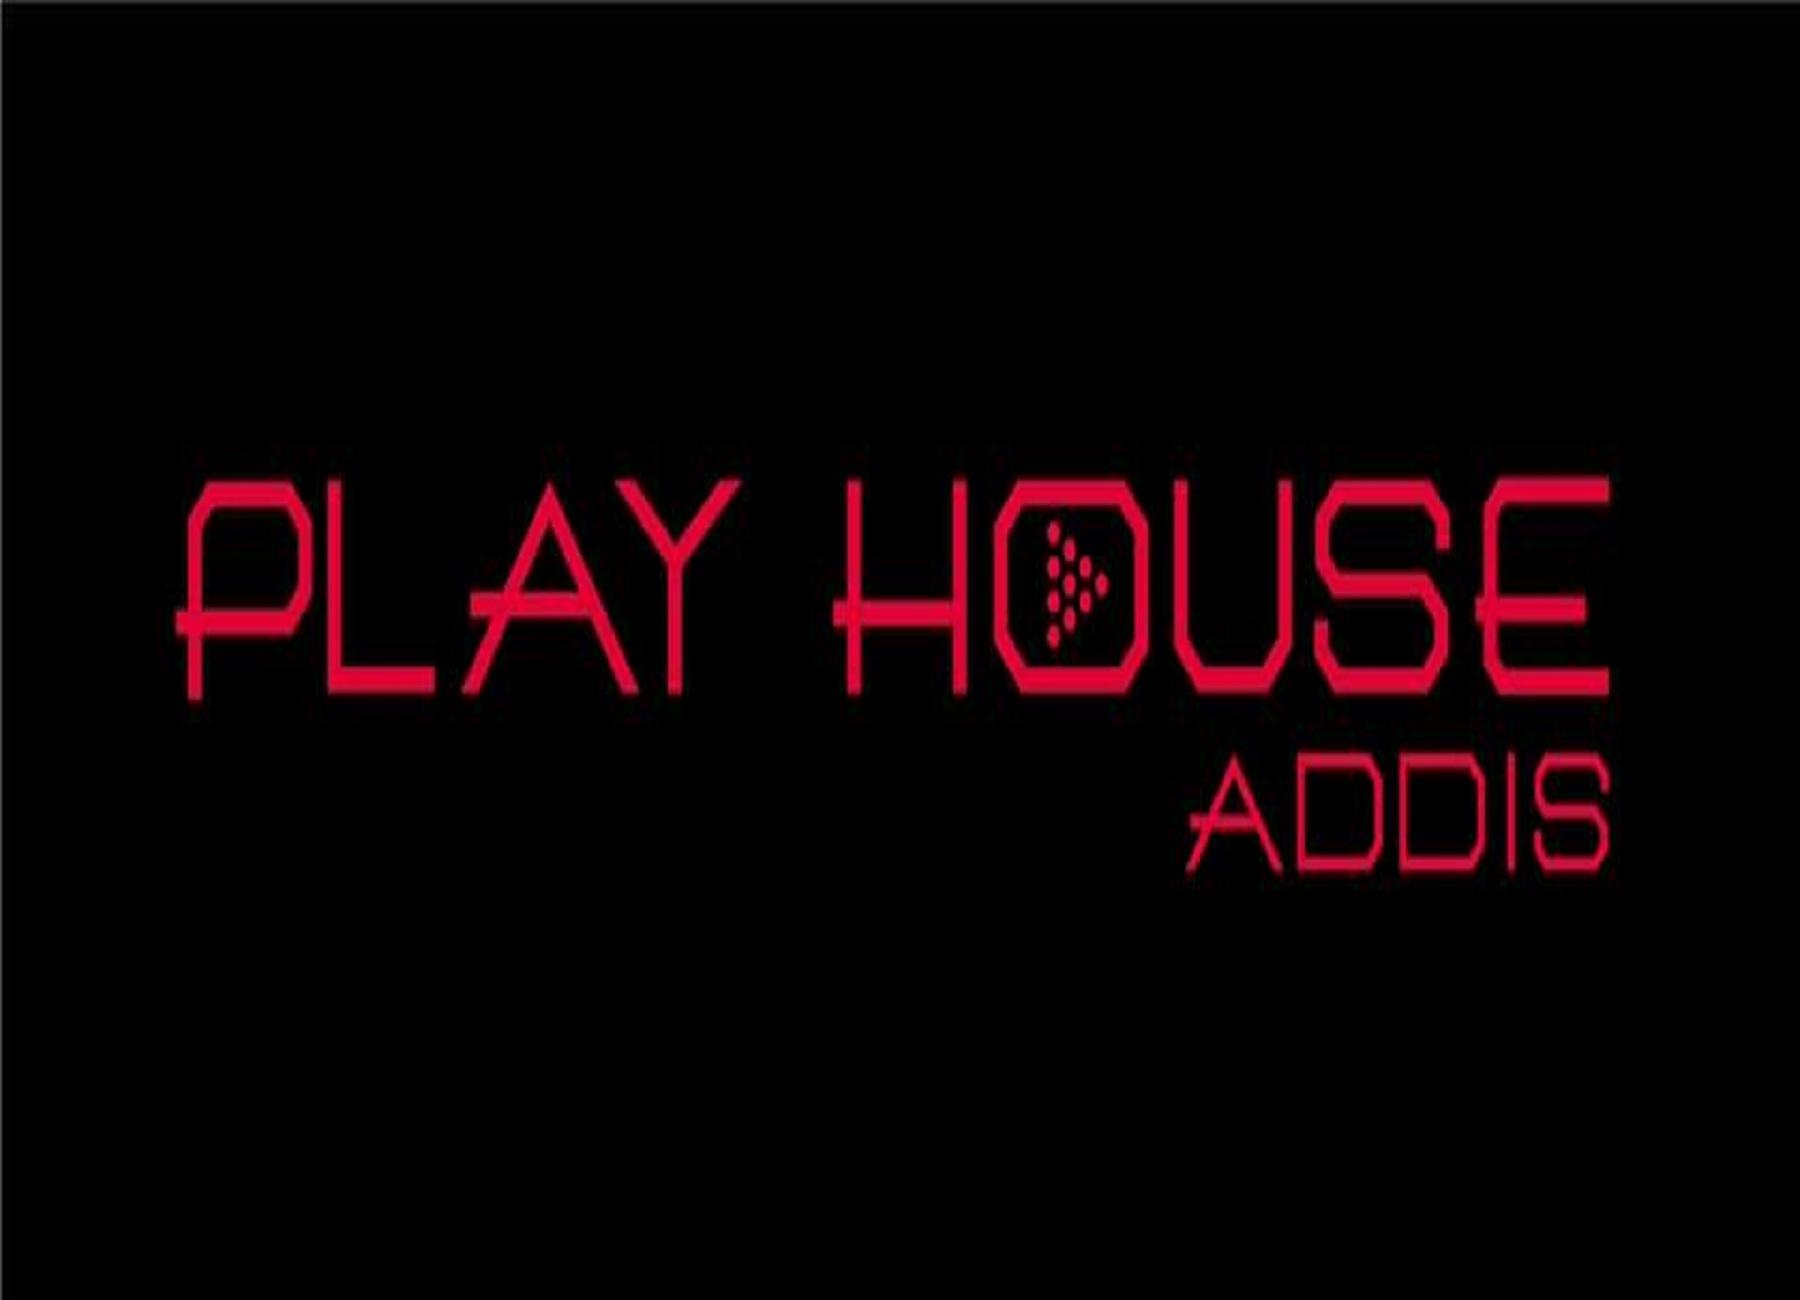 Play House Addis